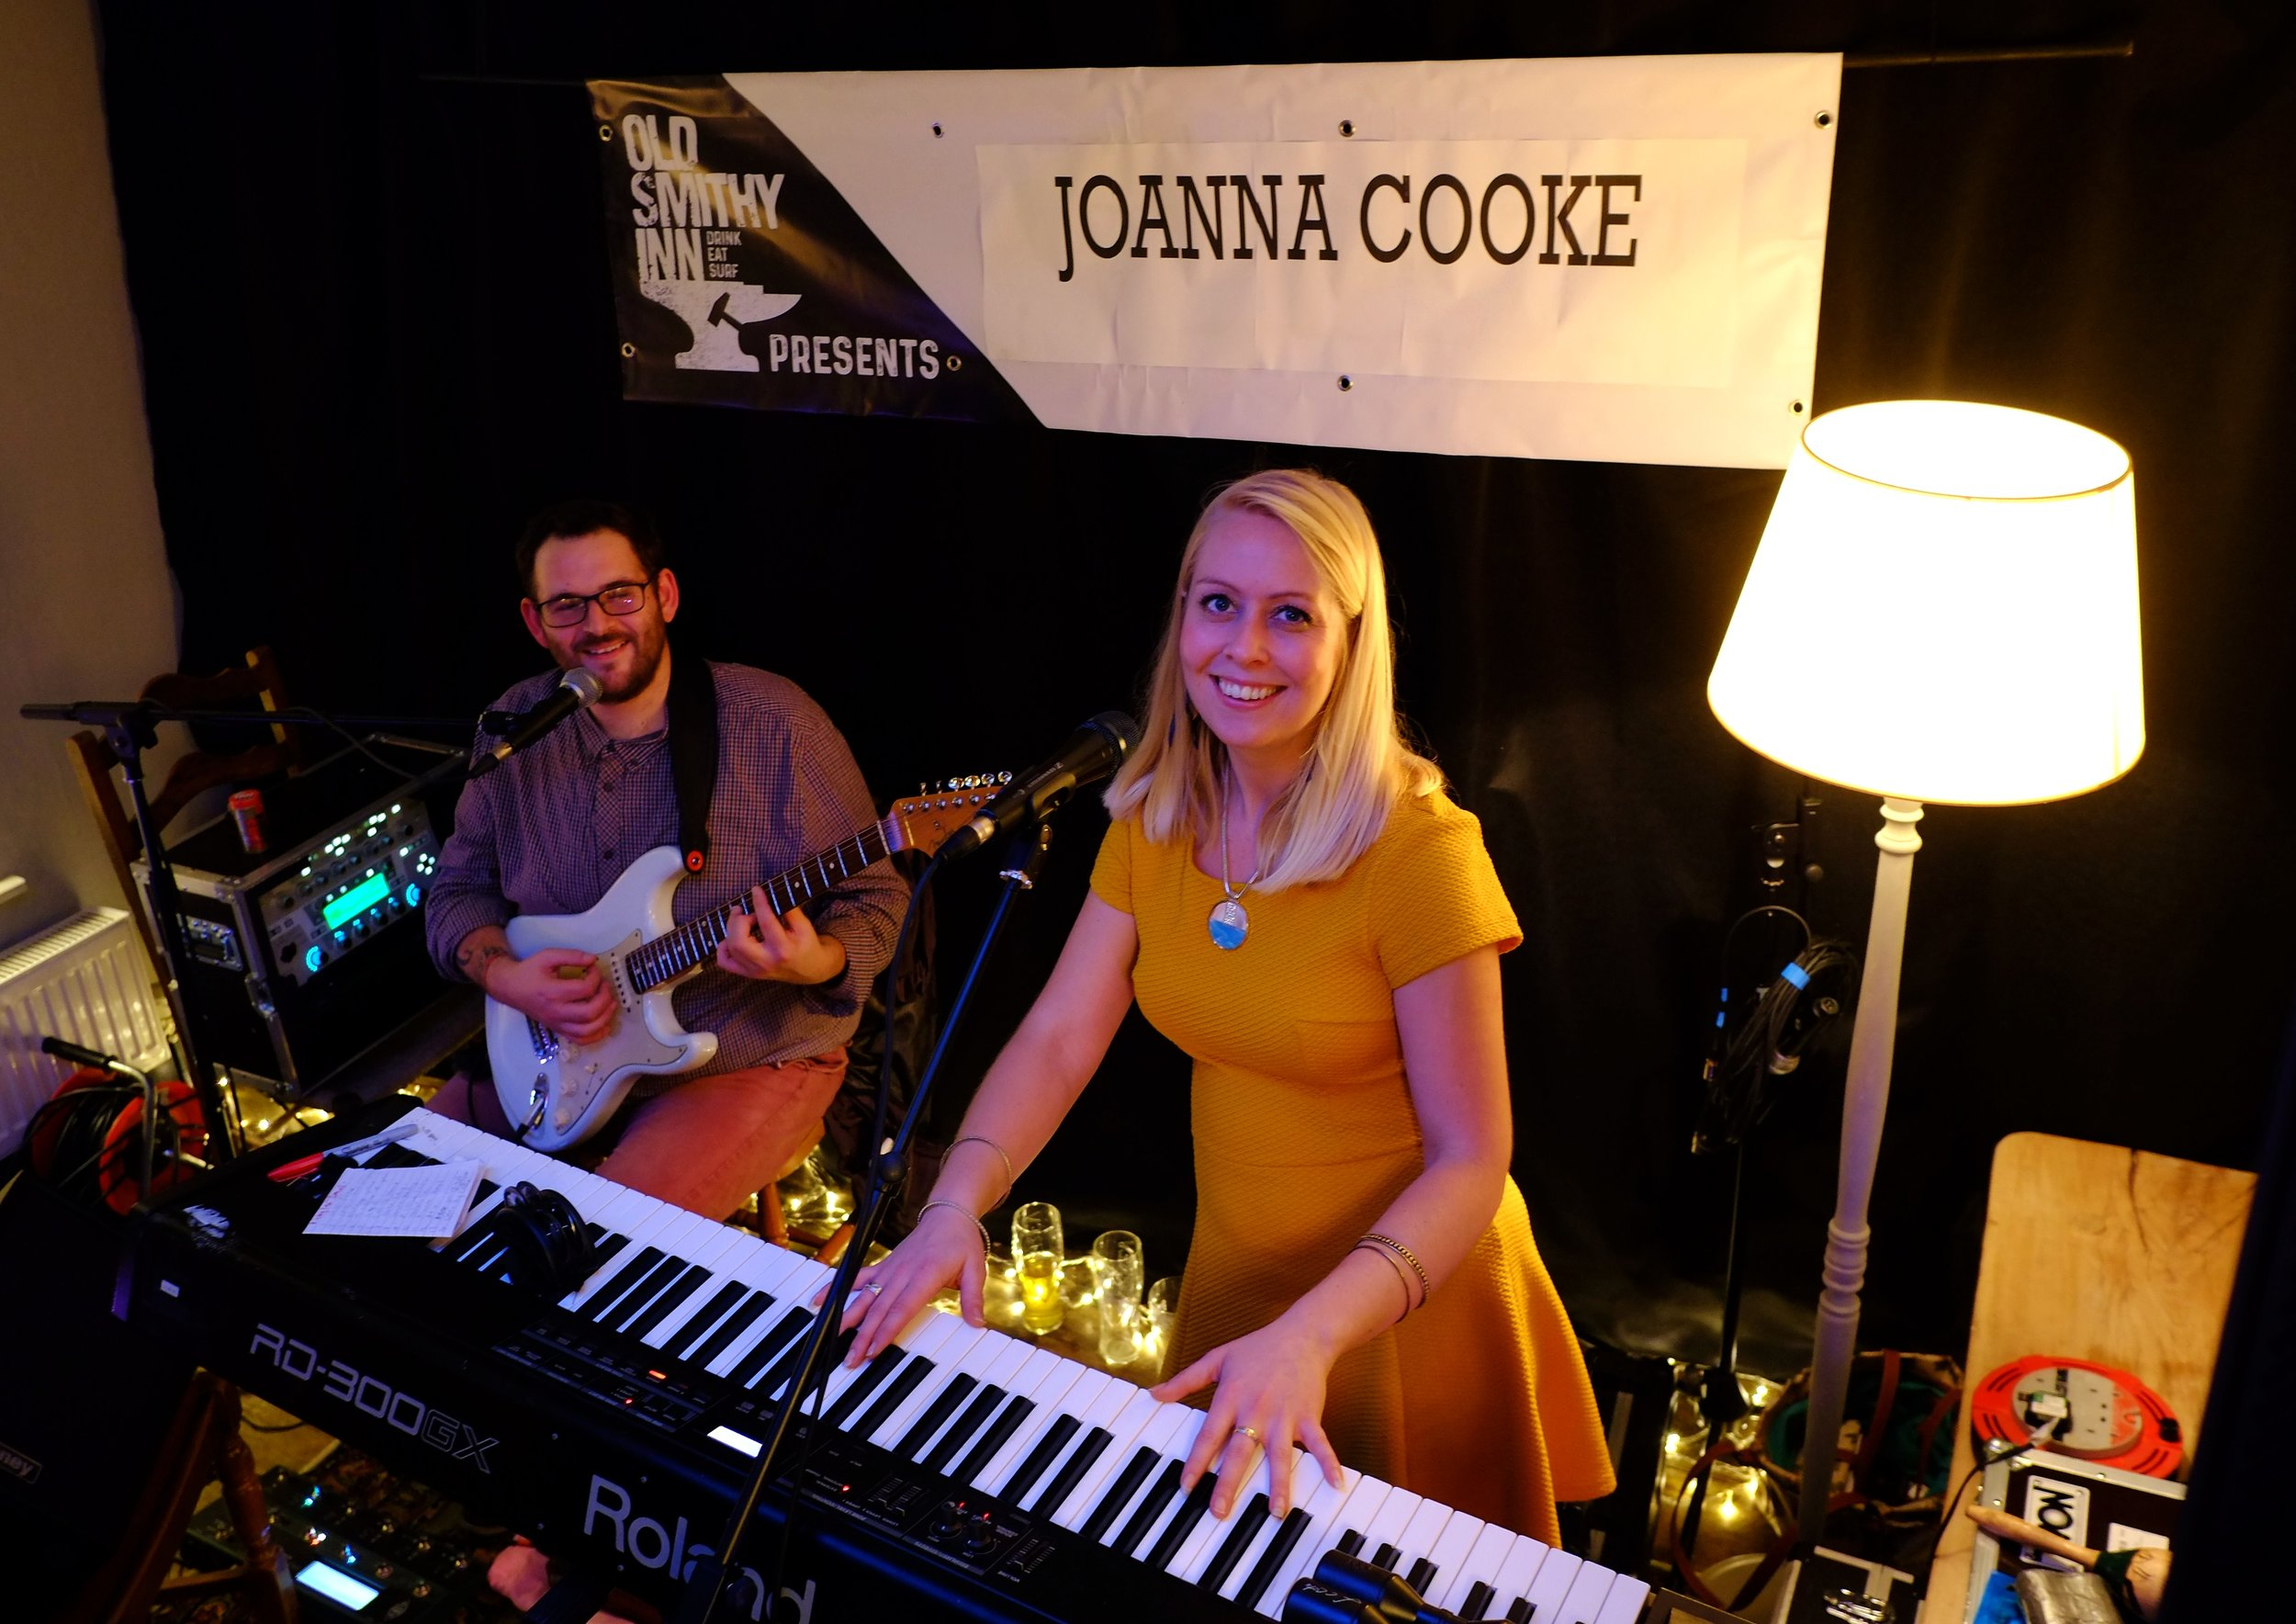 2018 12 13th - Joanna Cooke 038.JPG